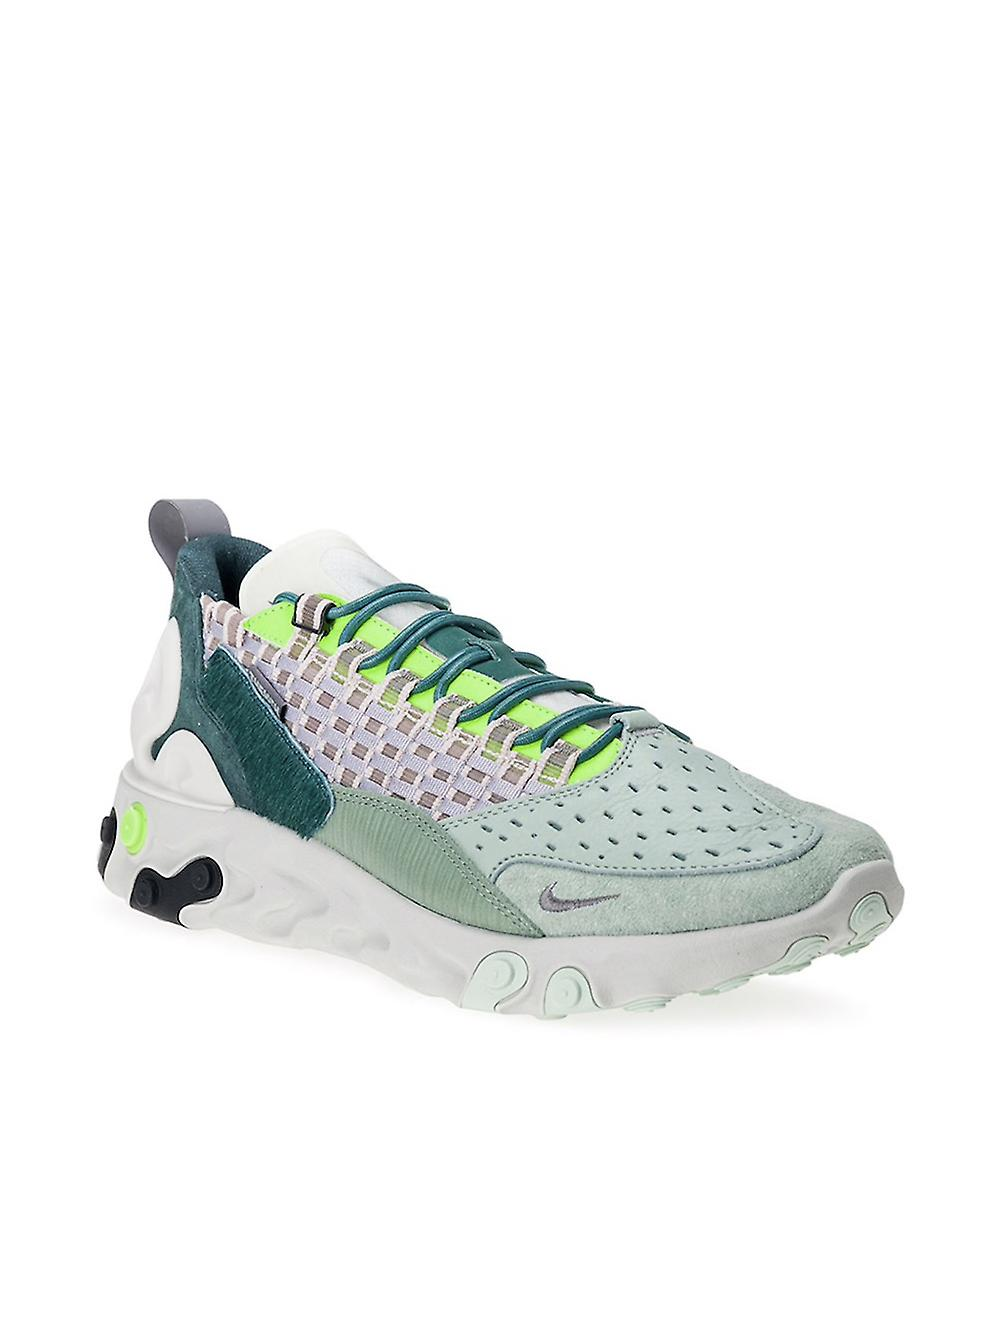 Nike Ezcr004065 Men's Green Fabric Sneakers E0mgzG